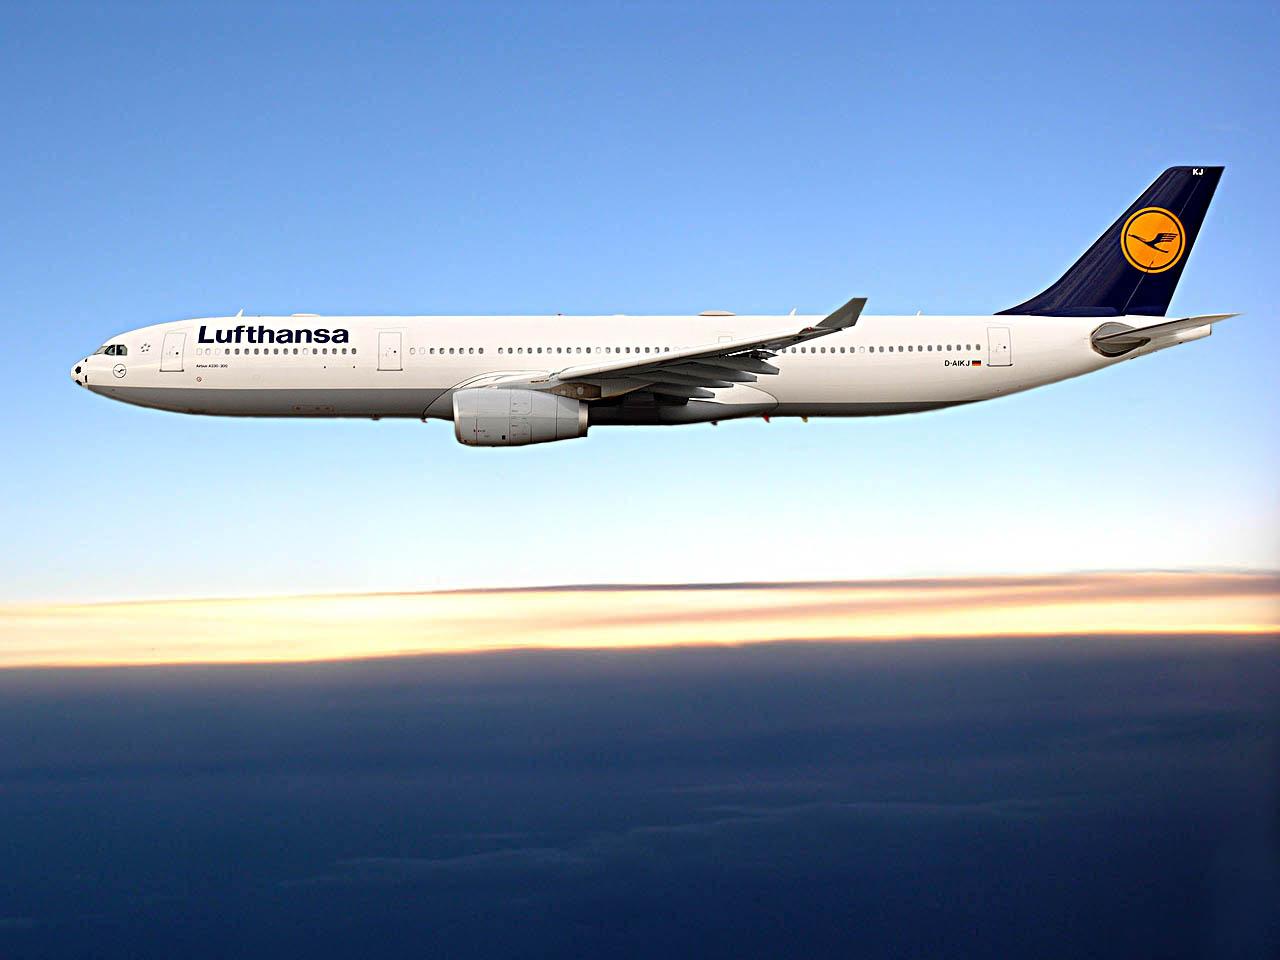 Lufthansa flight passenger door